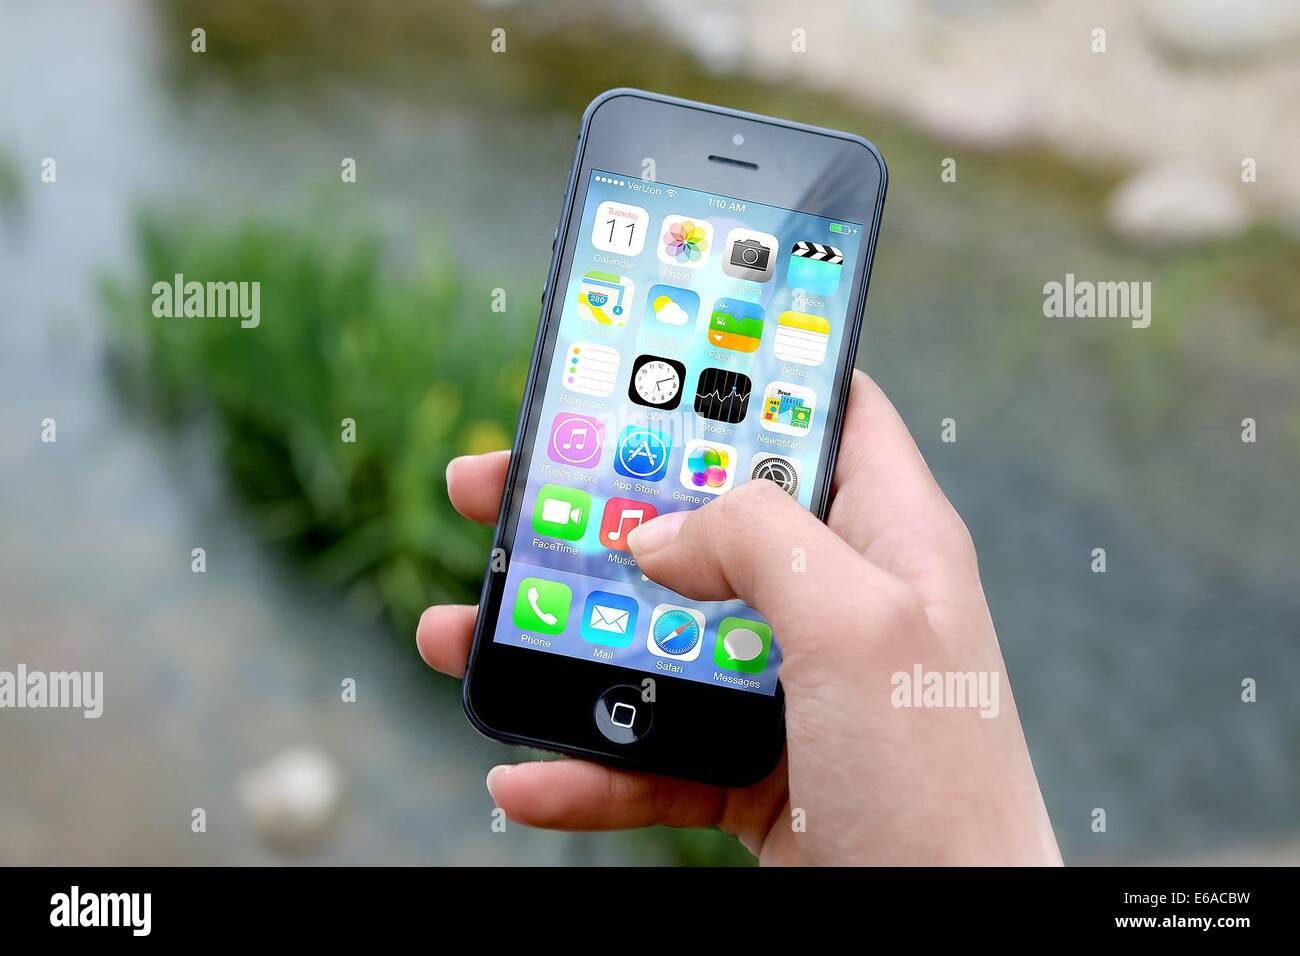 Smartphone iphone apps apple inc teléfono móvil Imagen De Stock